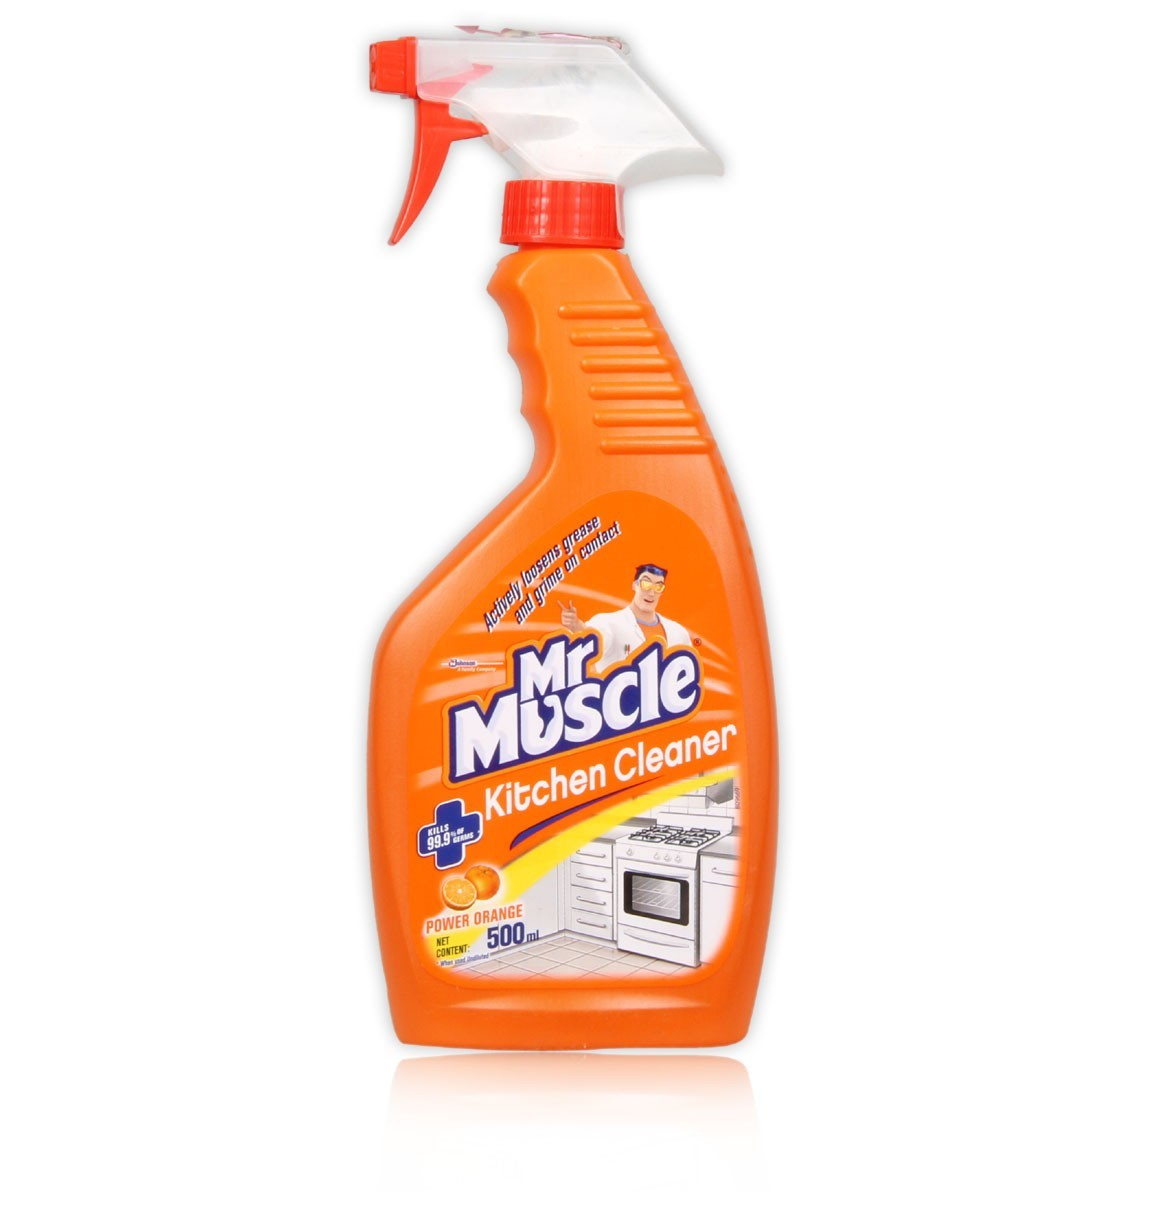 Kitchen Cleaner: Mr. Muscle Kitchen Cleaner